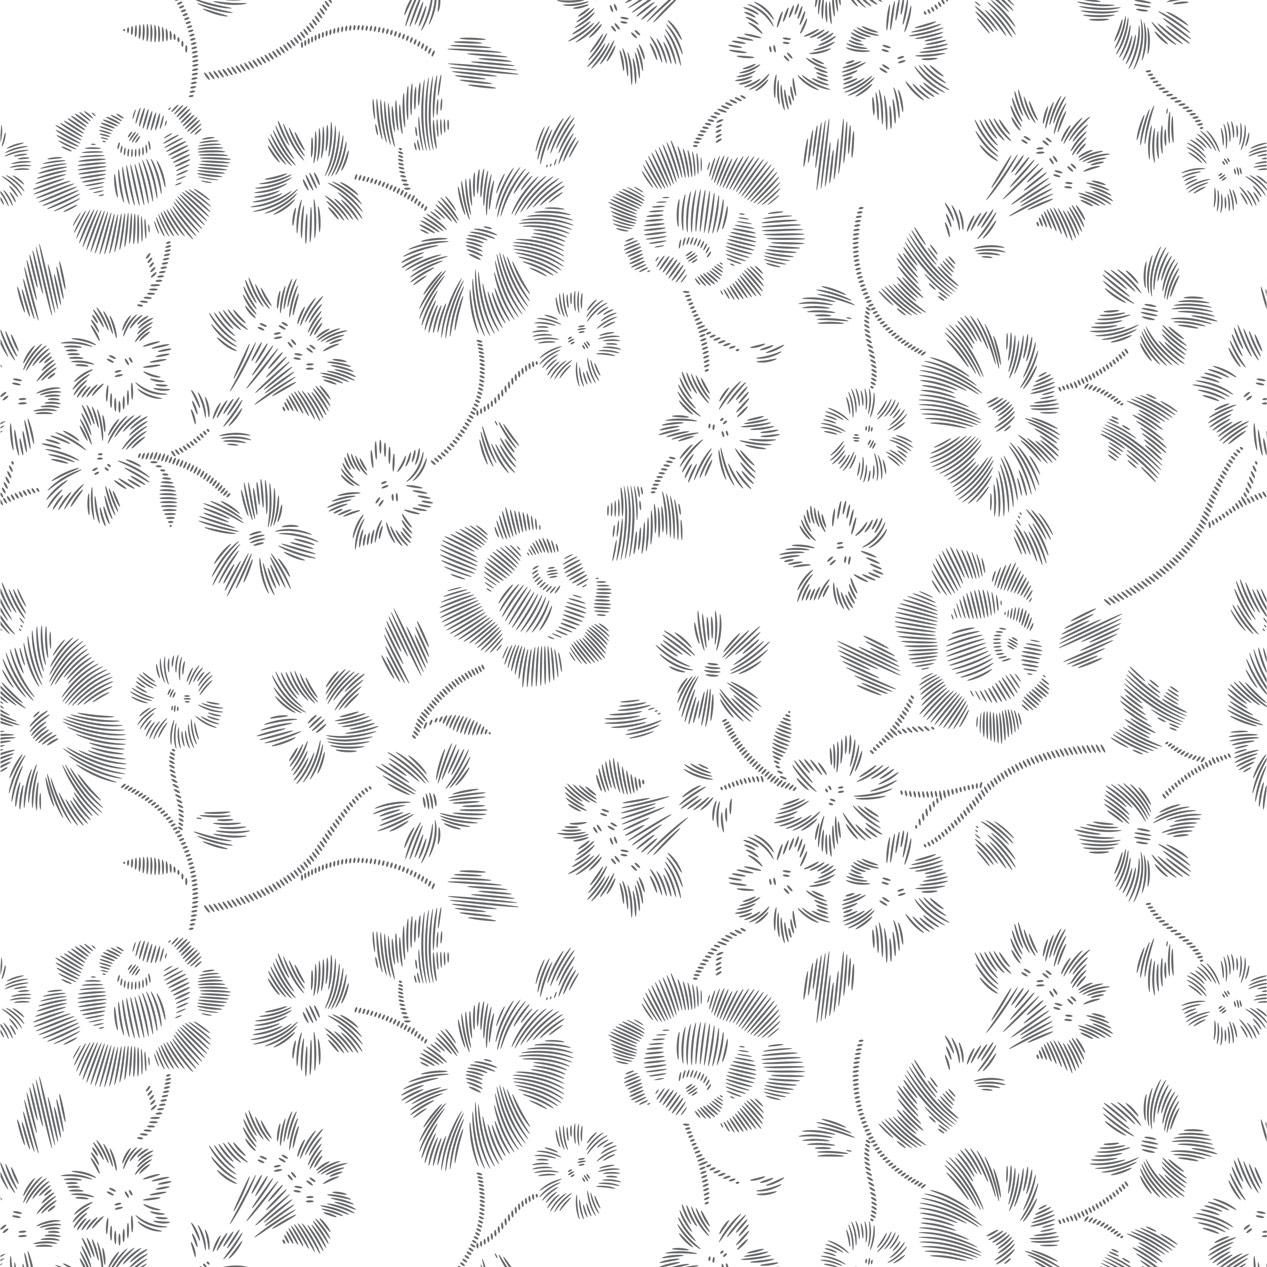 Papel de Parede Floral Cinza Desenho Riscas